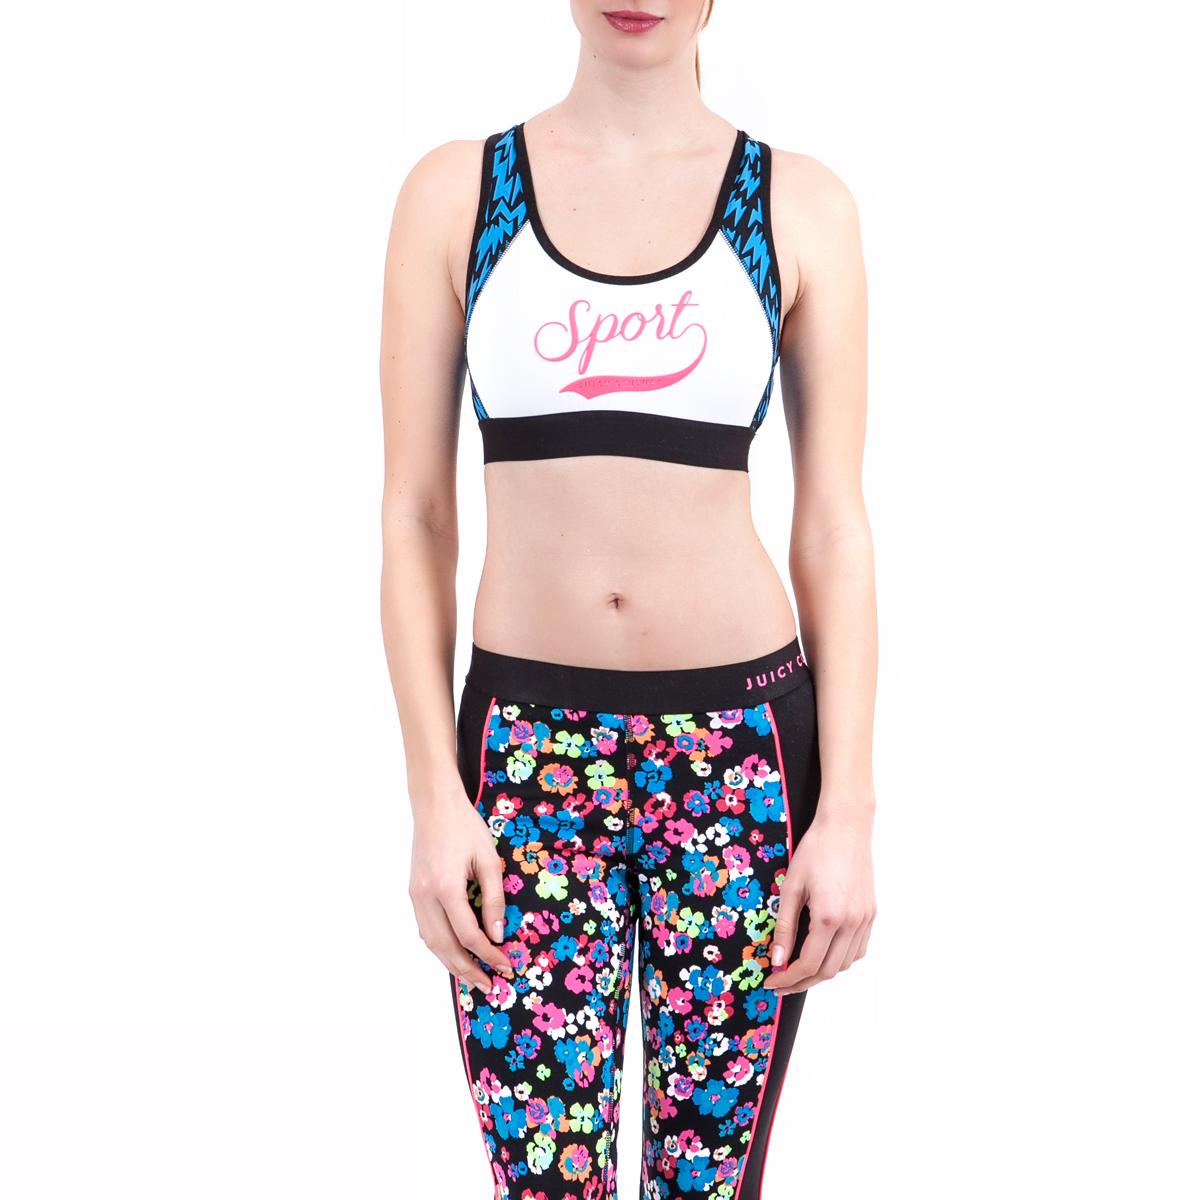 JUICY COUTURE - Γυναικείο μπουστάκι Juicy Couture λευκό γυναικεία ρούχα αθλητικά μπουστάκια